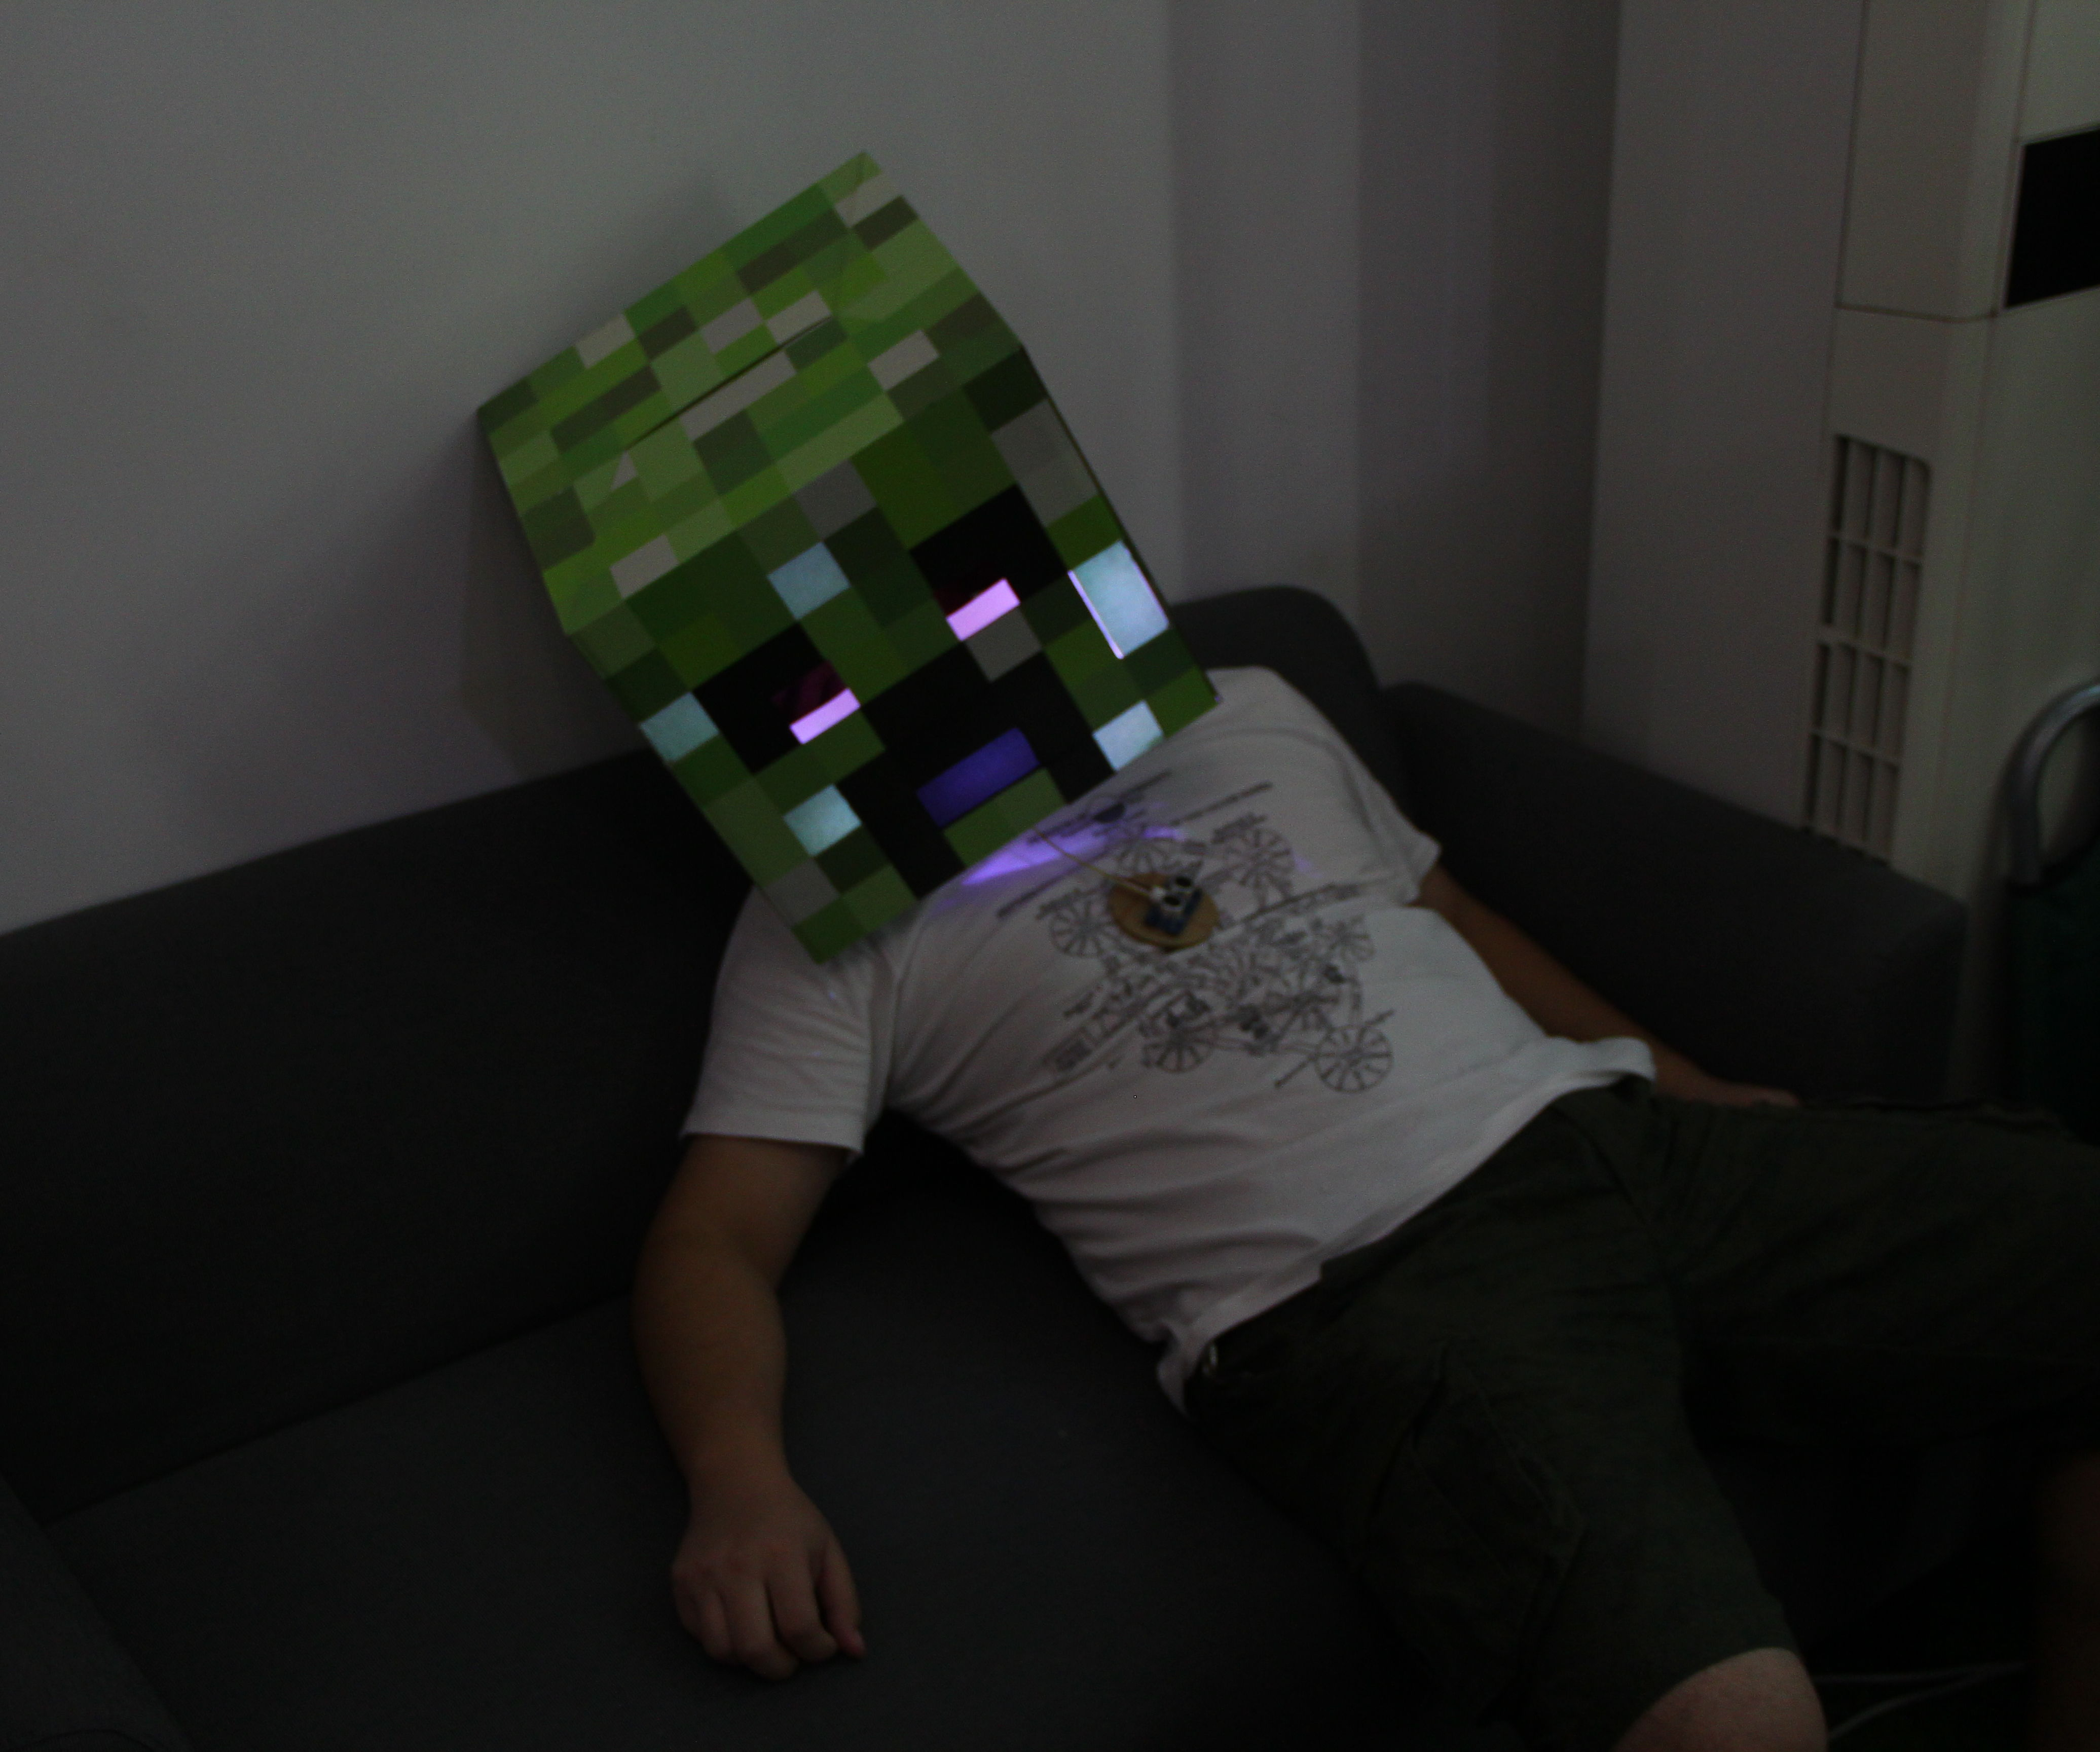 How to Make a Vivid Flashing Minecraft Creeper